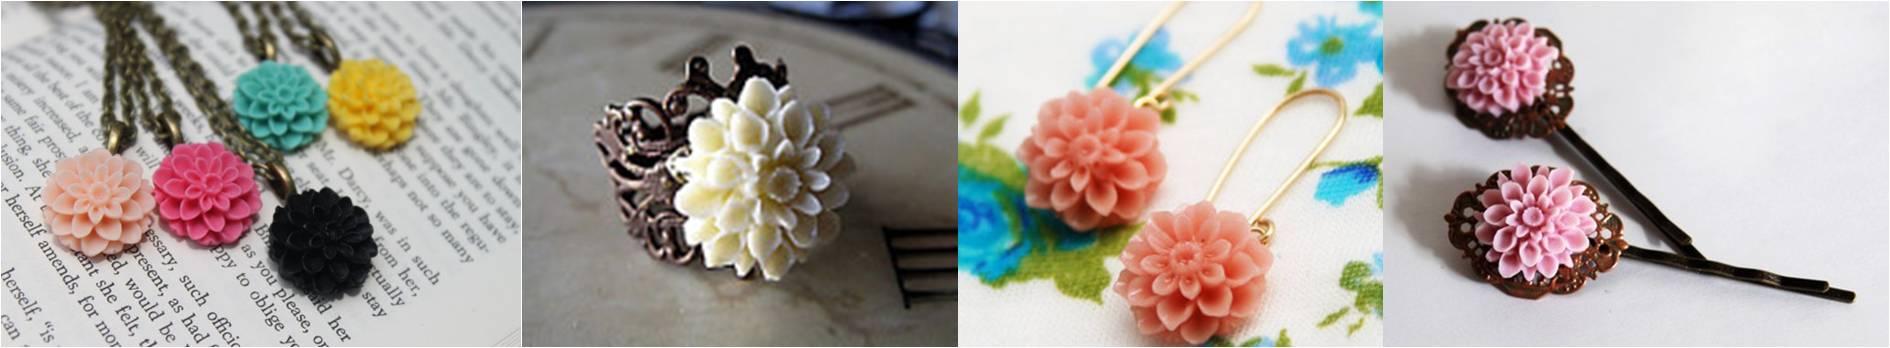 chrysanthemum-sample-r-.jpg